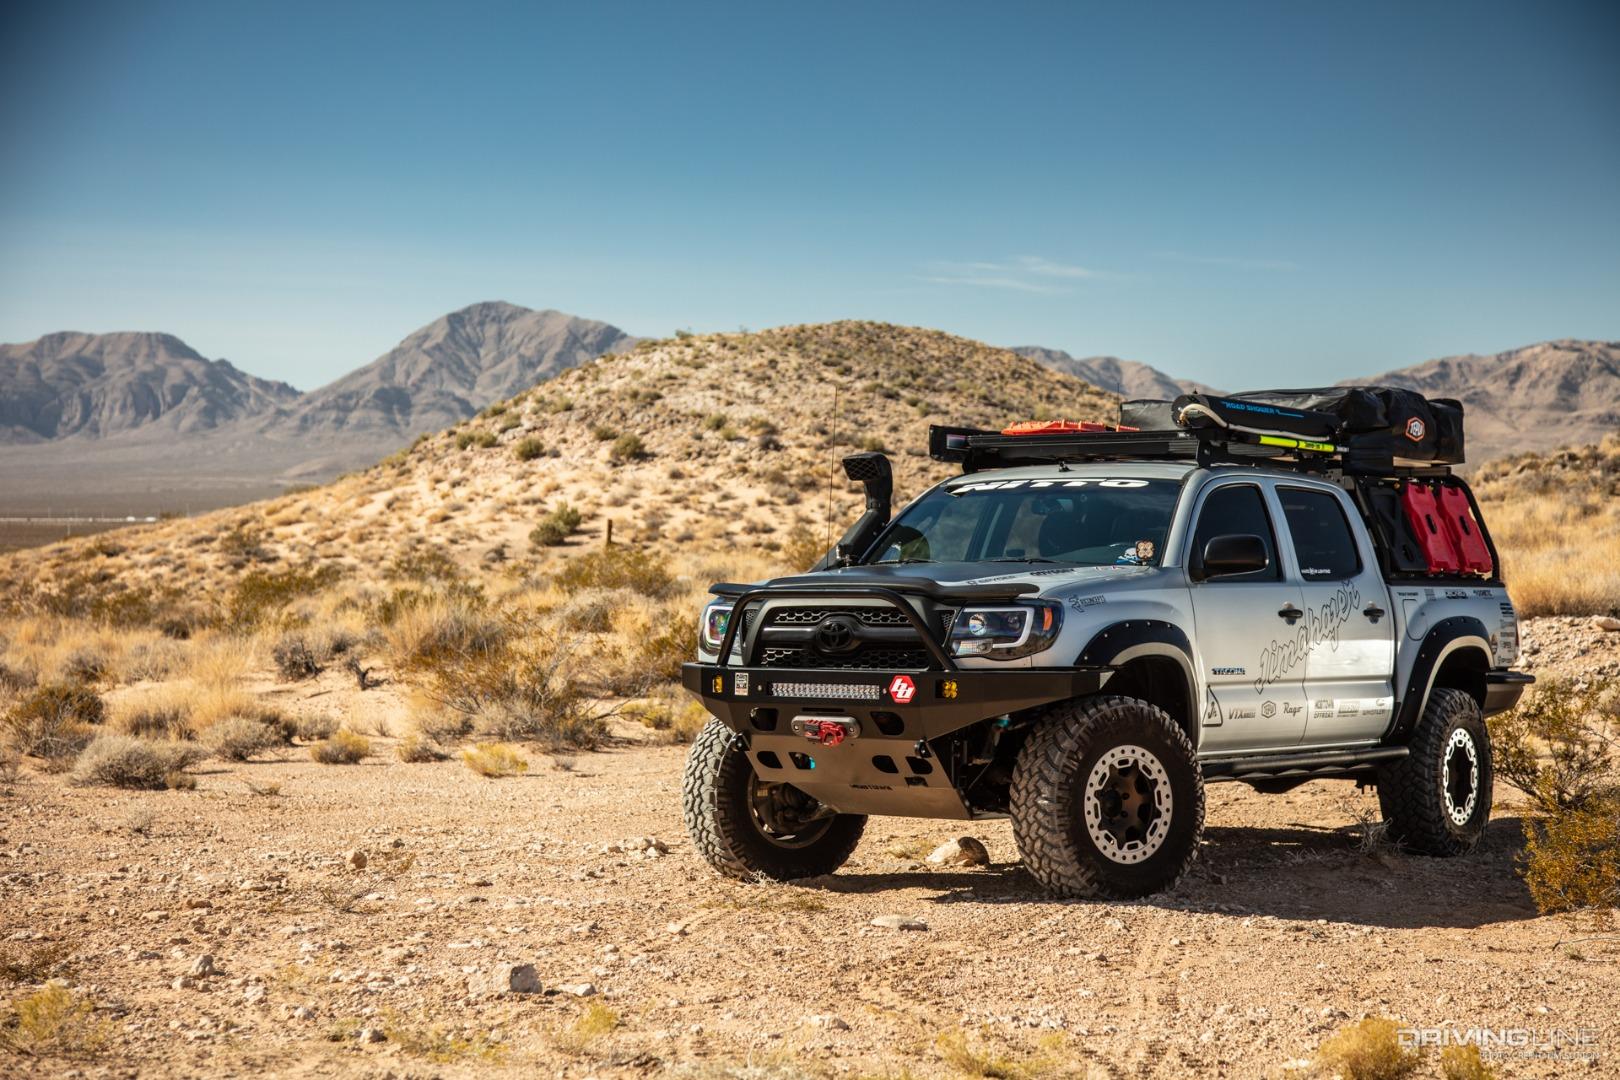 Jimahajer's Epic Overland Toyota Tacoma | DrivingLine